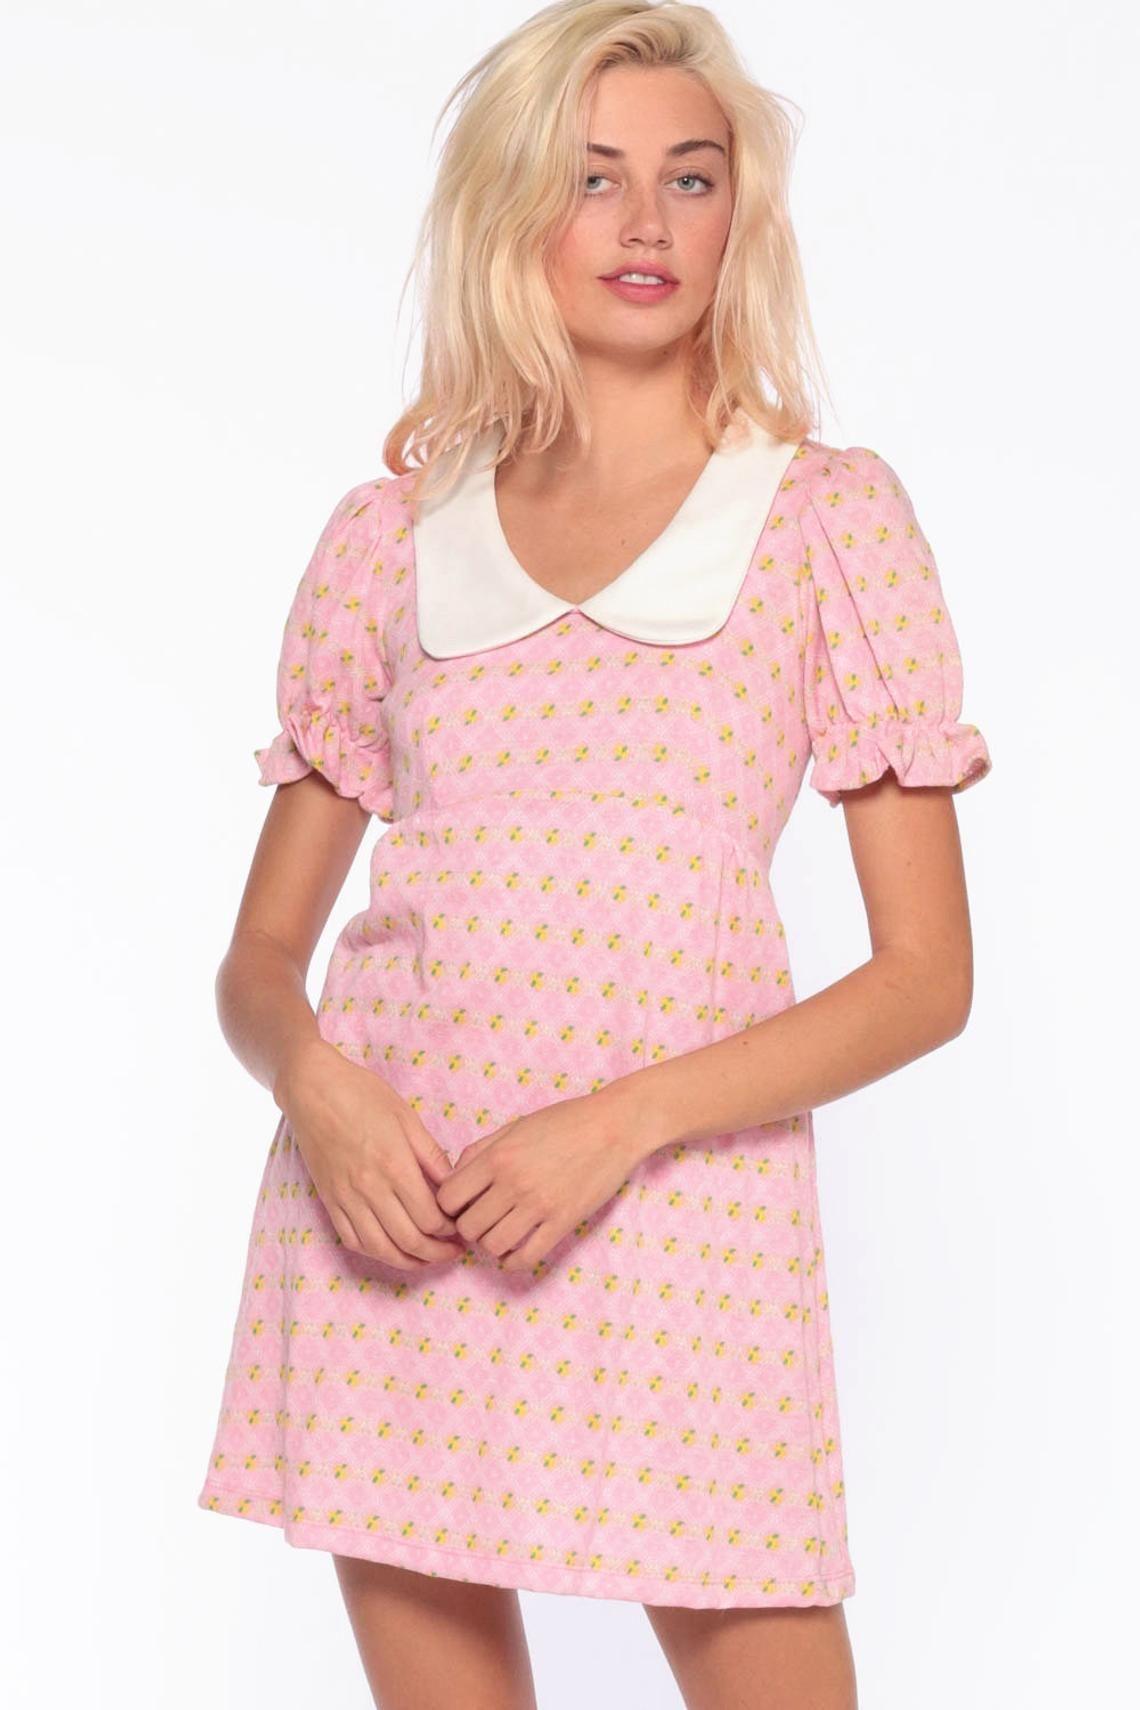 60s Babydoll Dress Pink Peter Pan Mod Mini Dress Floral Etsy Mod Mini Dress Pink Dress Babydoll Dress